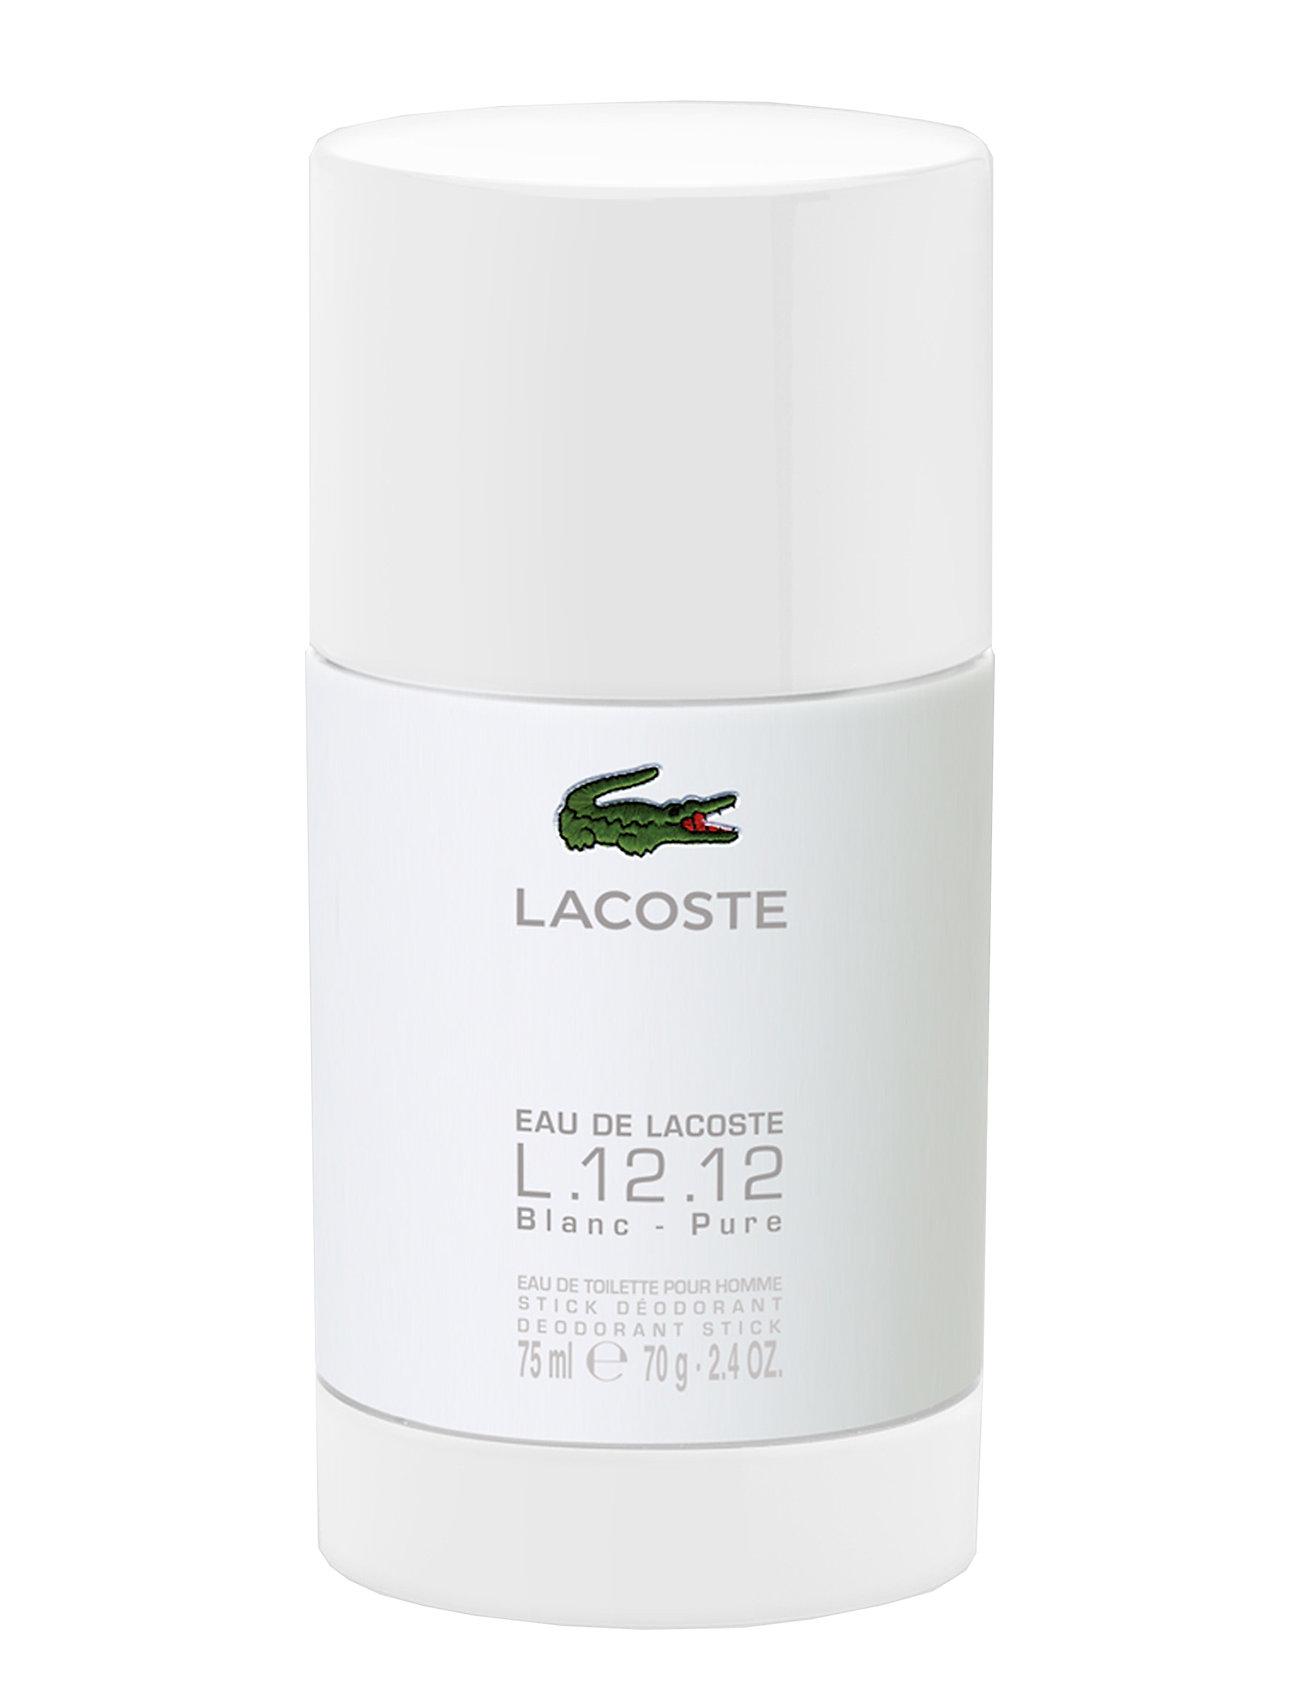 Image of L.12.12 White Ph Deodorantstick Beauty MEN Deodorants Sticks Nude Lacoste Fragrance (2917749635)